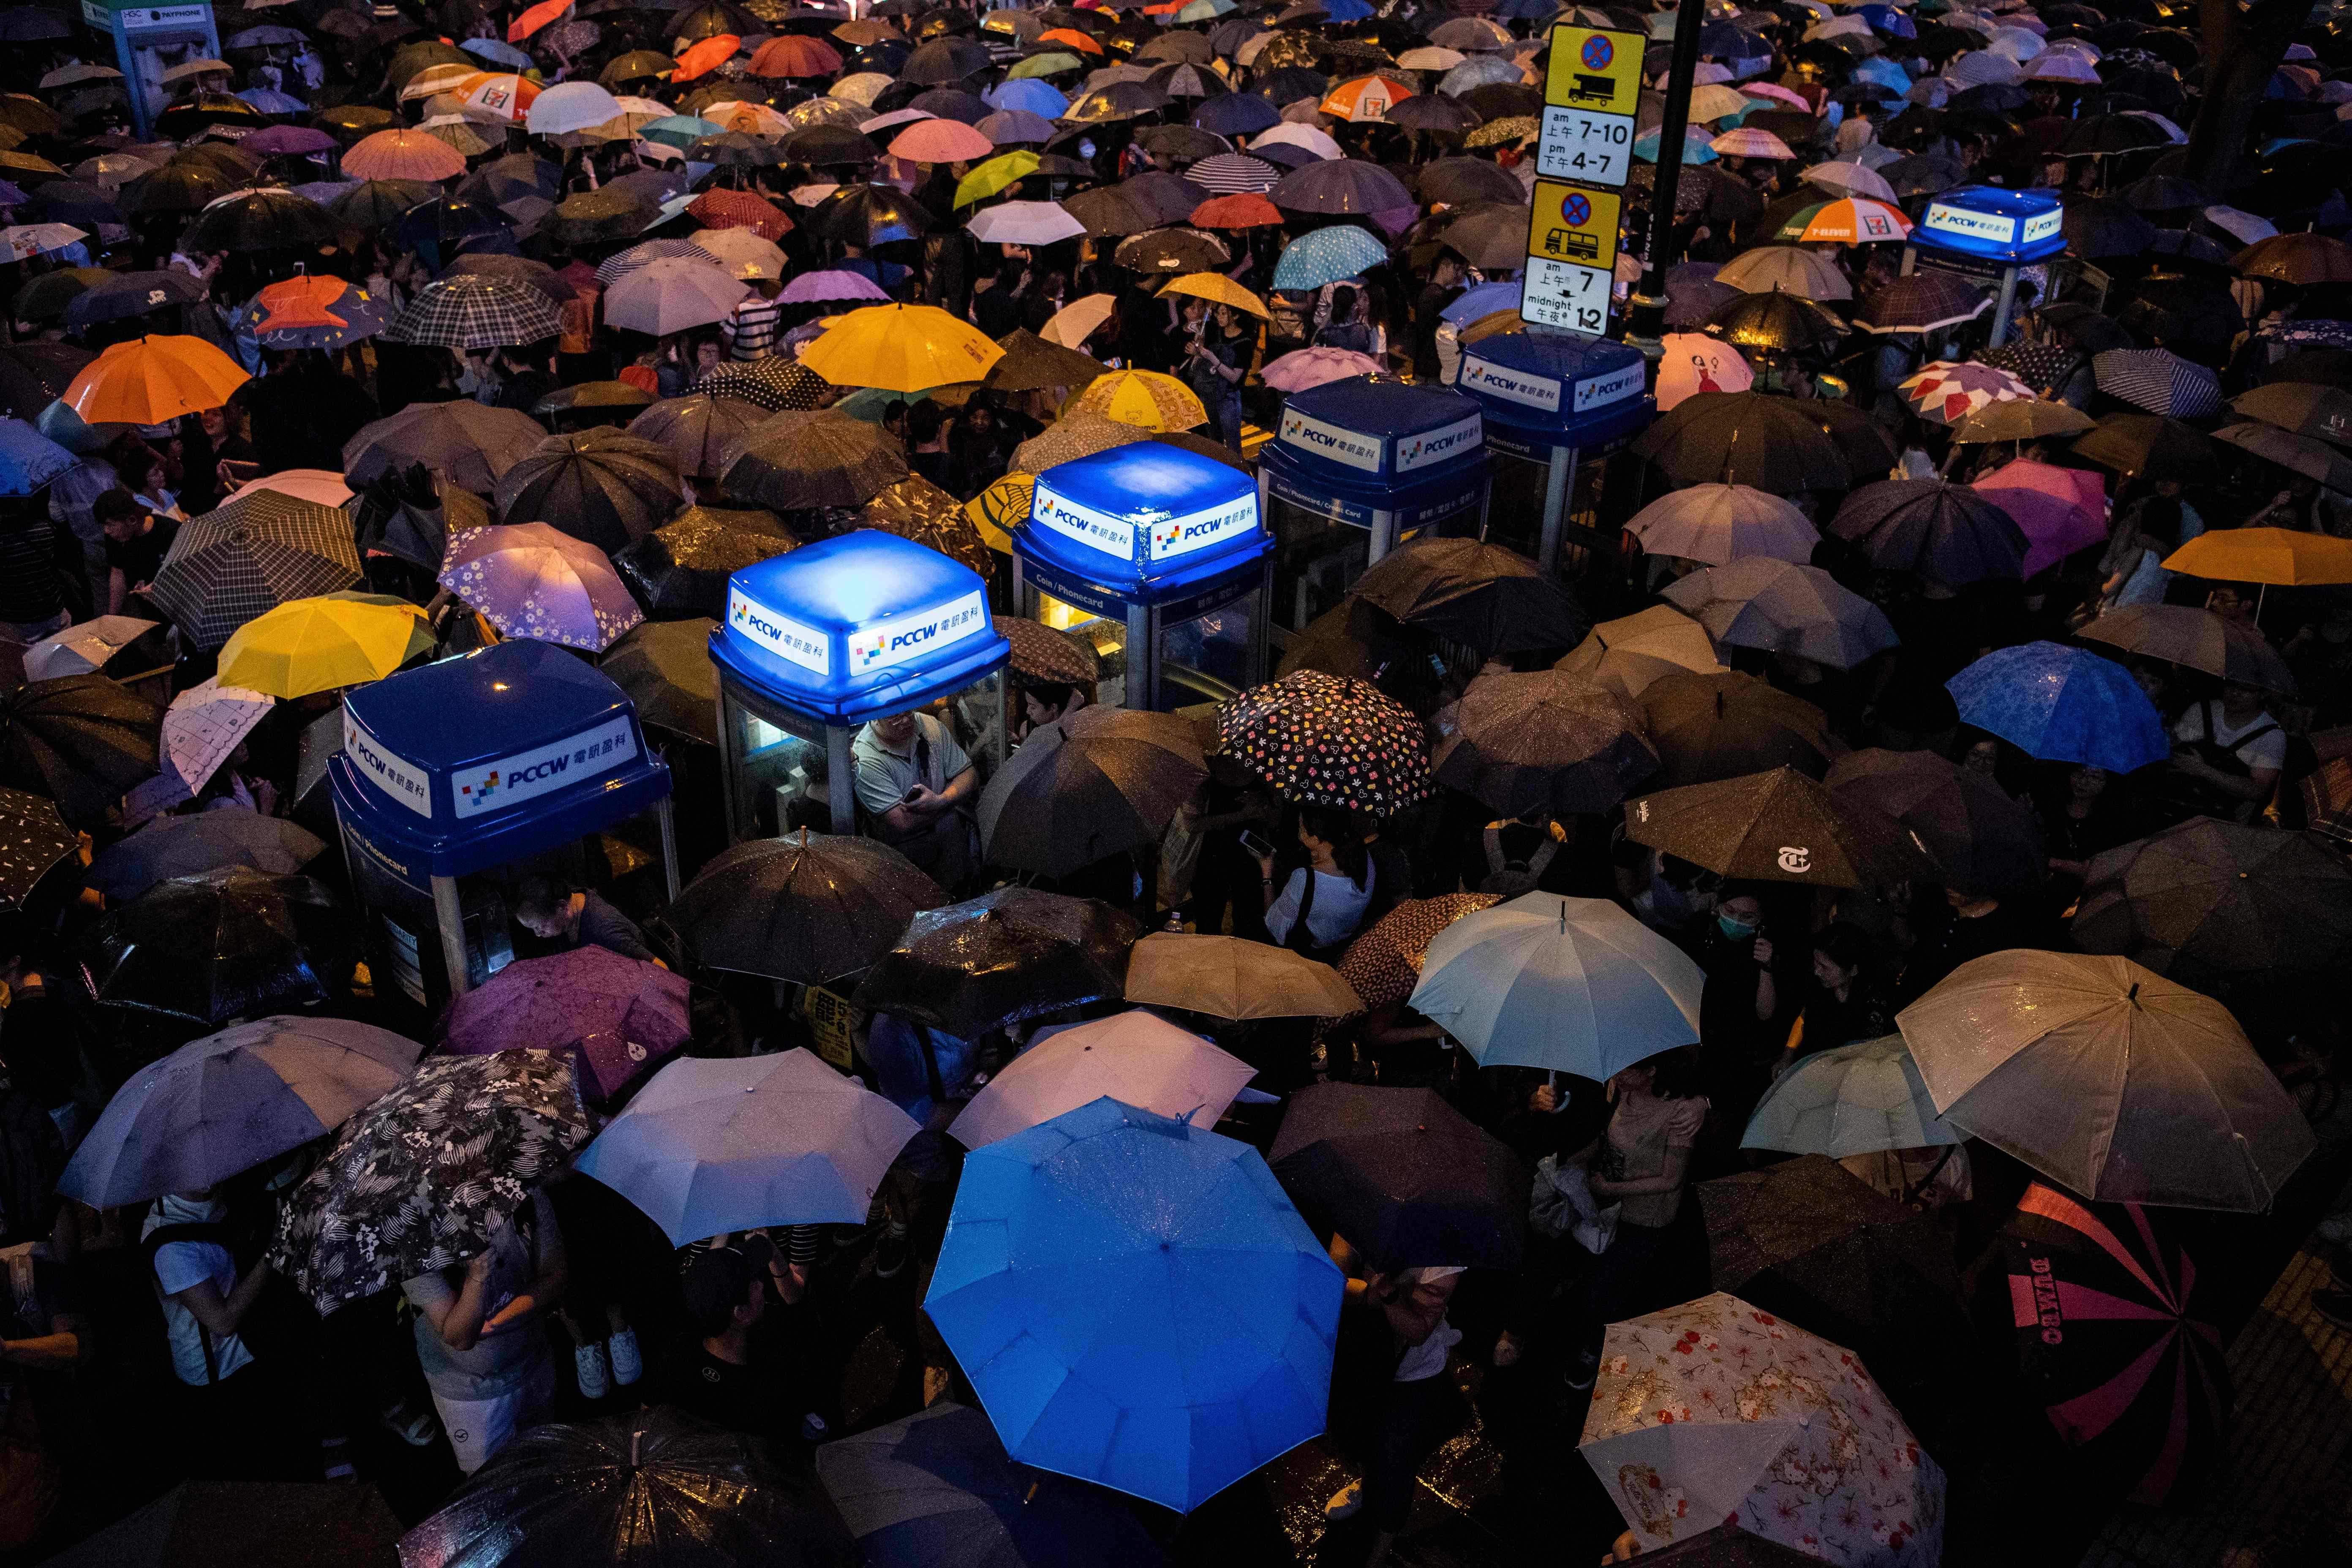 When Hong Kong civil servants protest too, can China still